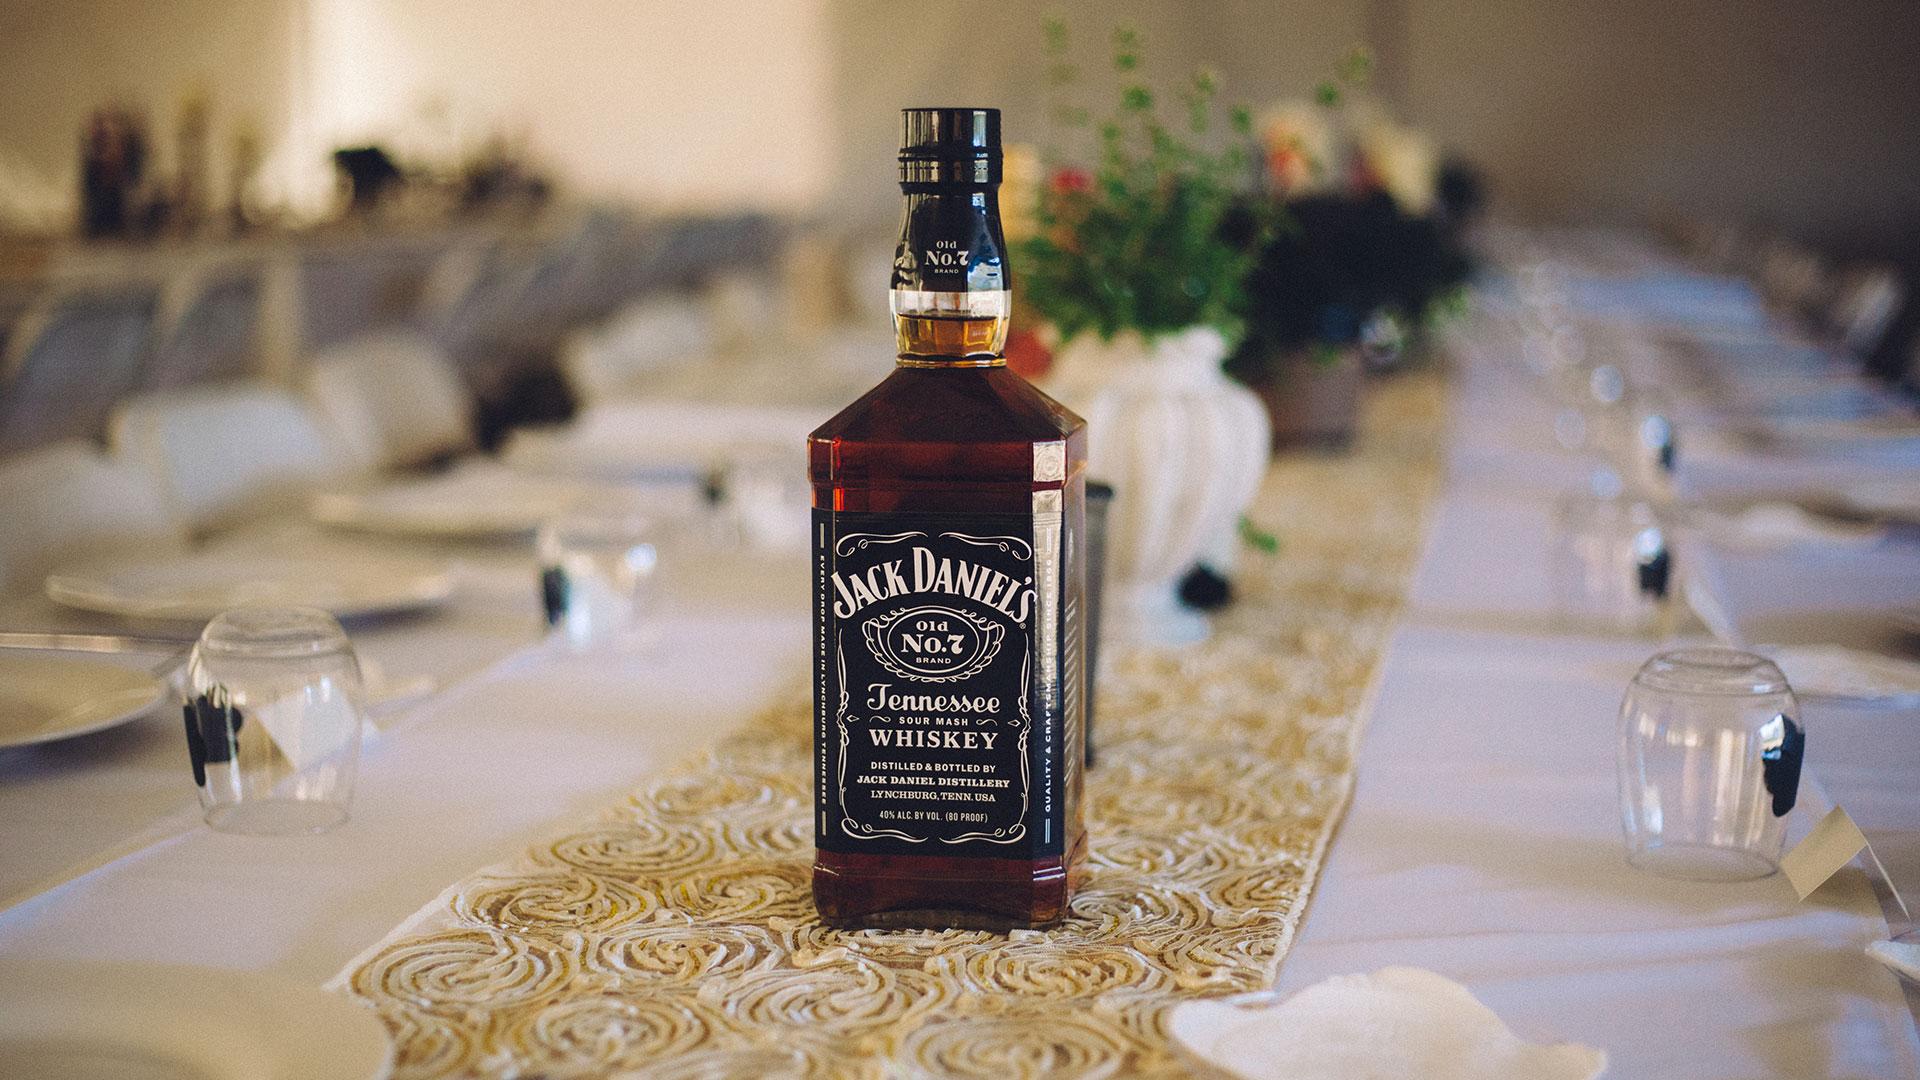 Craven-Media-Whiskey-Bottle-Up-Close